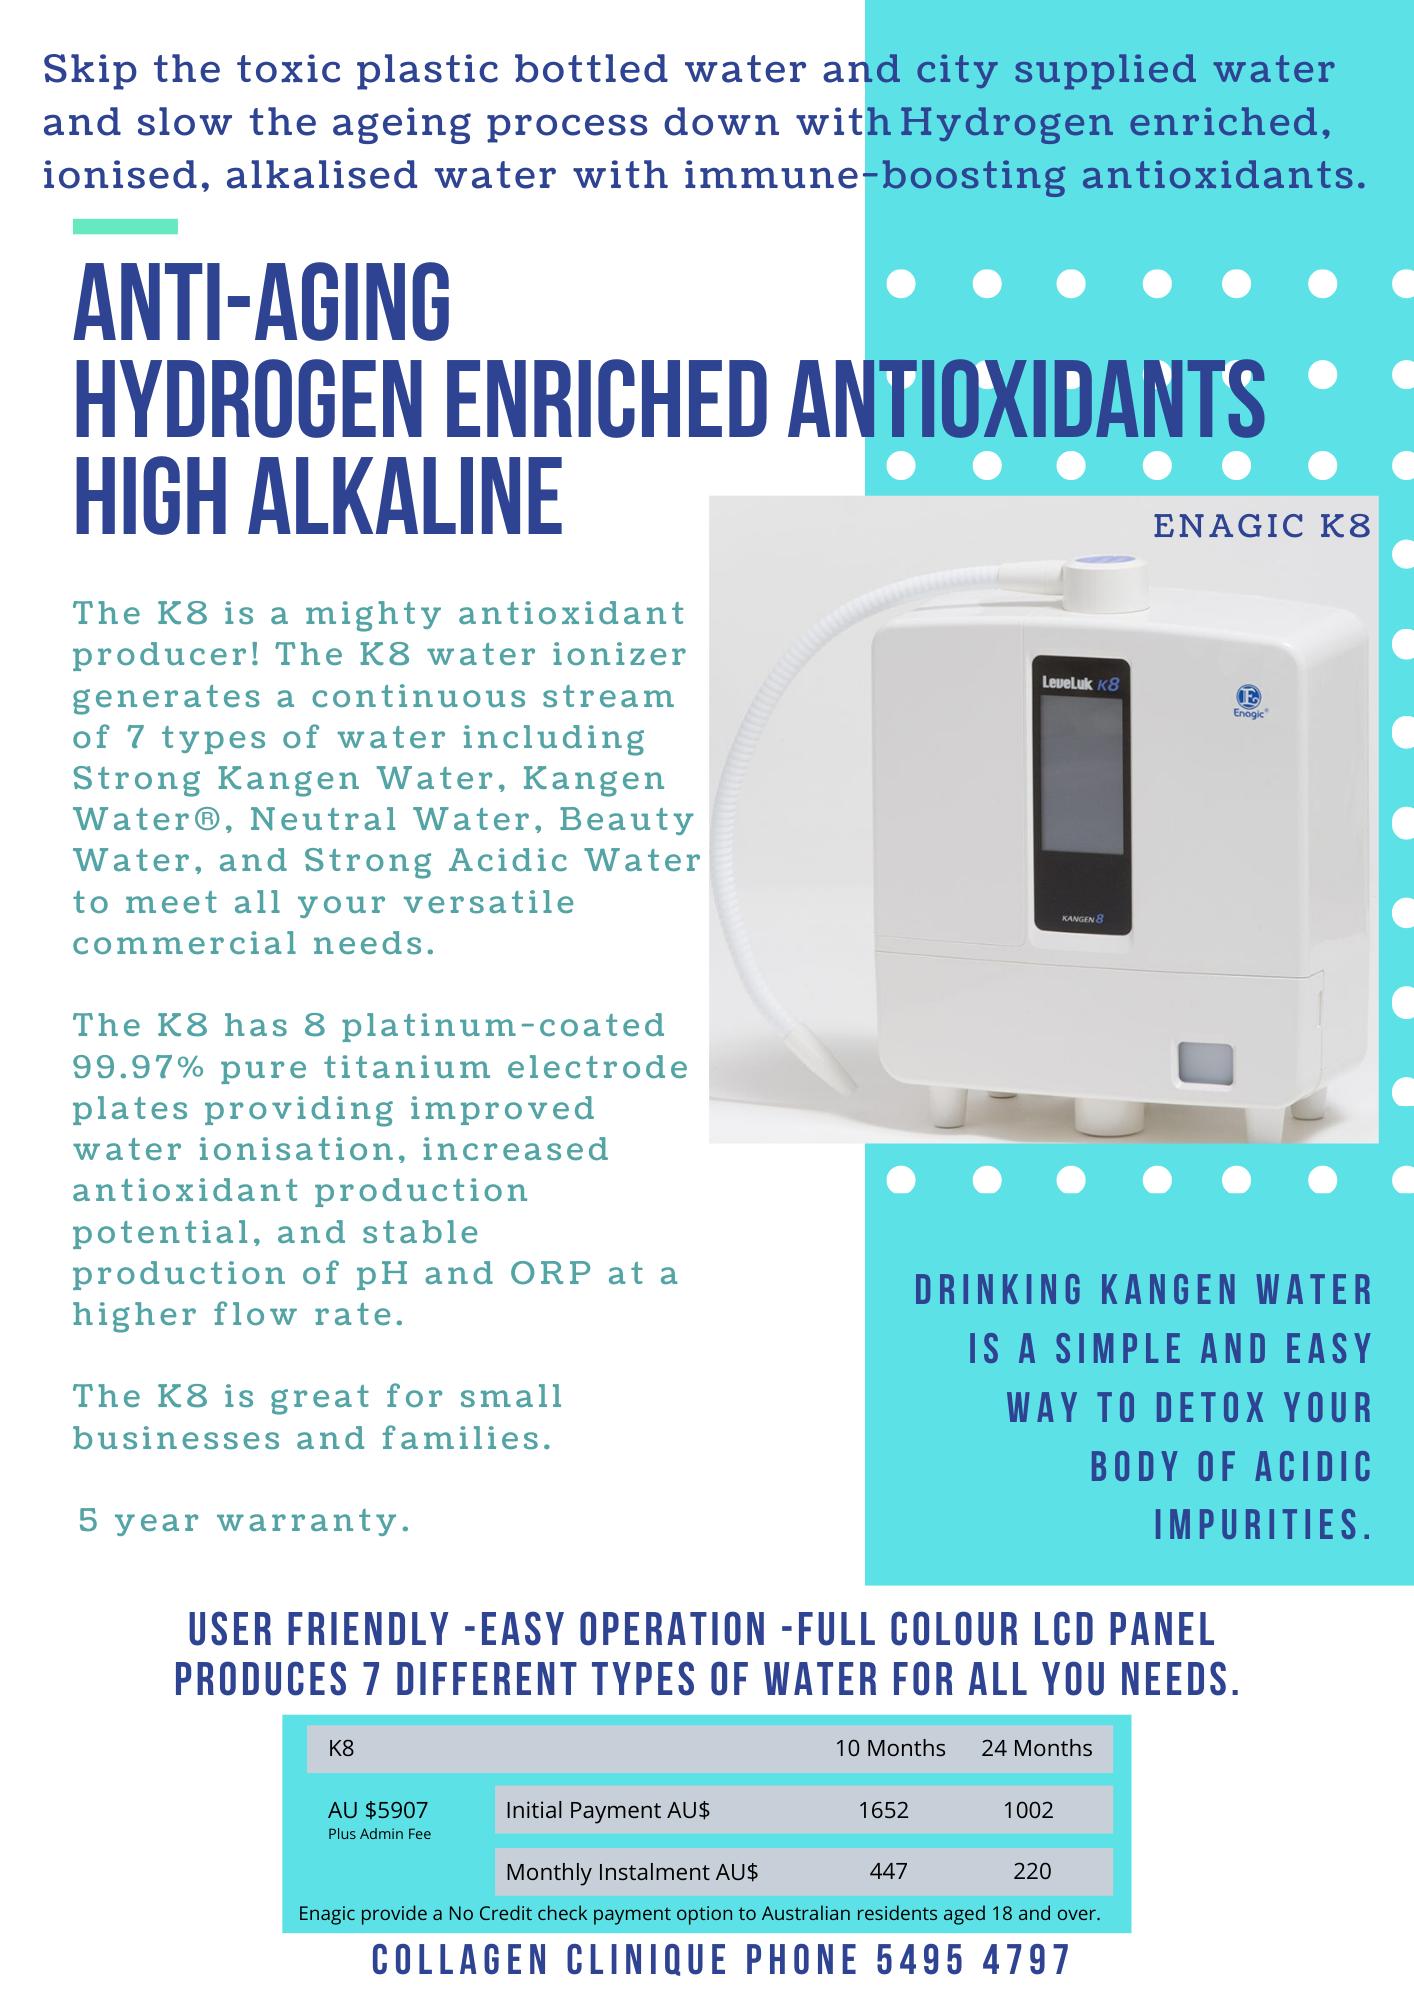 Enagic Kangen 8 K8, Kangen water machine, Water filte,r alkaline water, ionised water